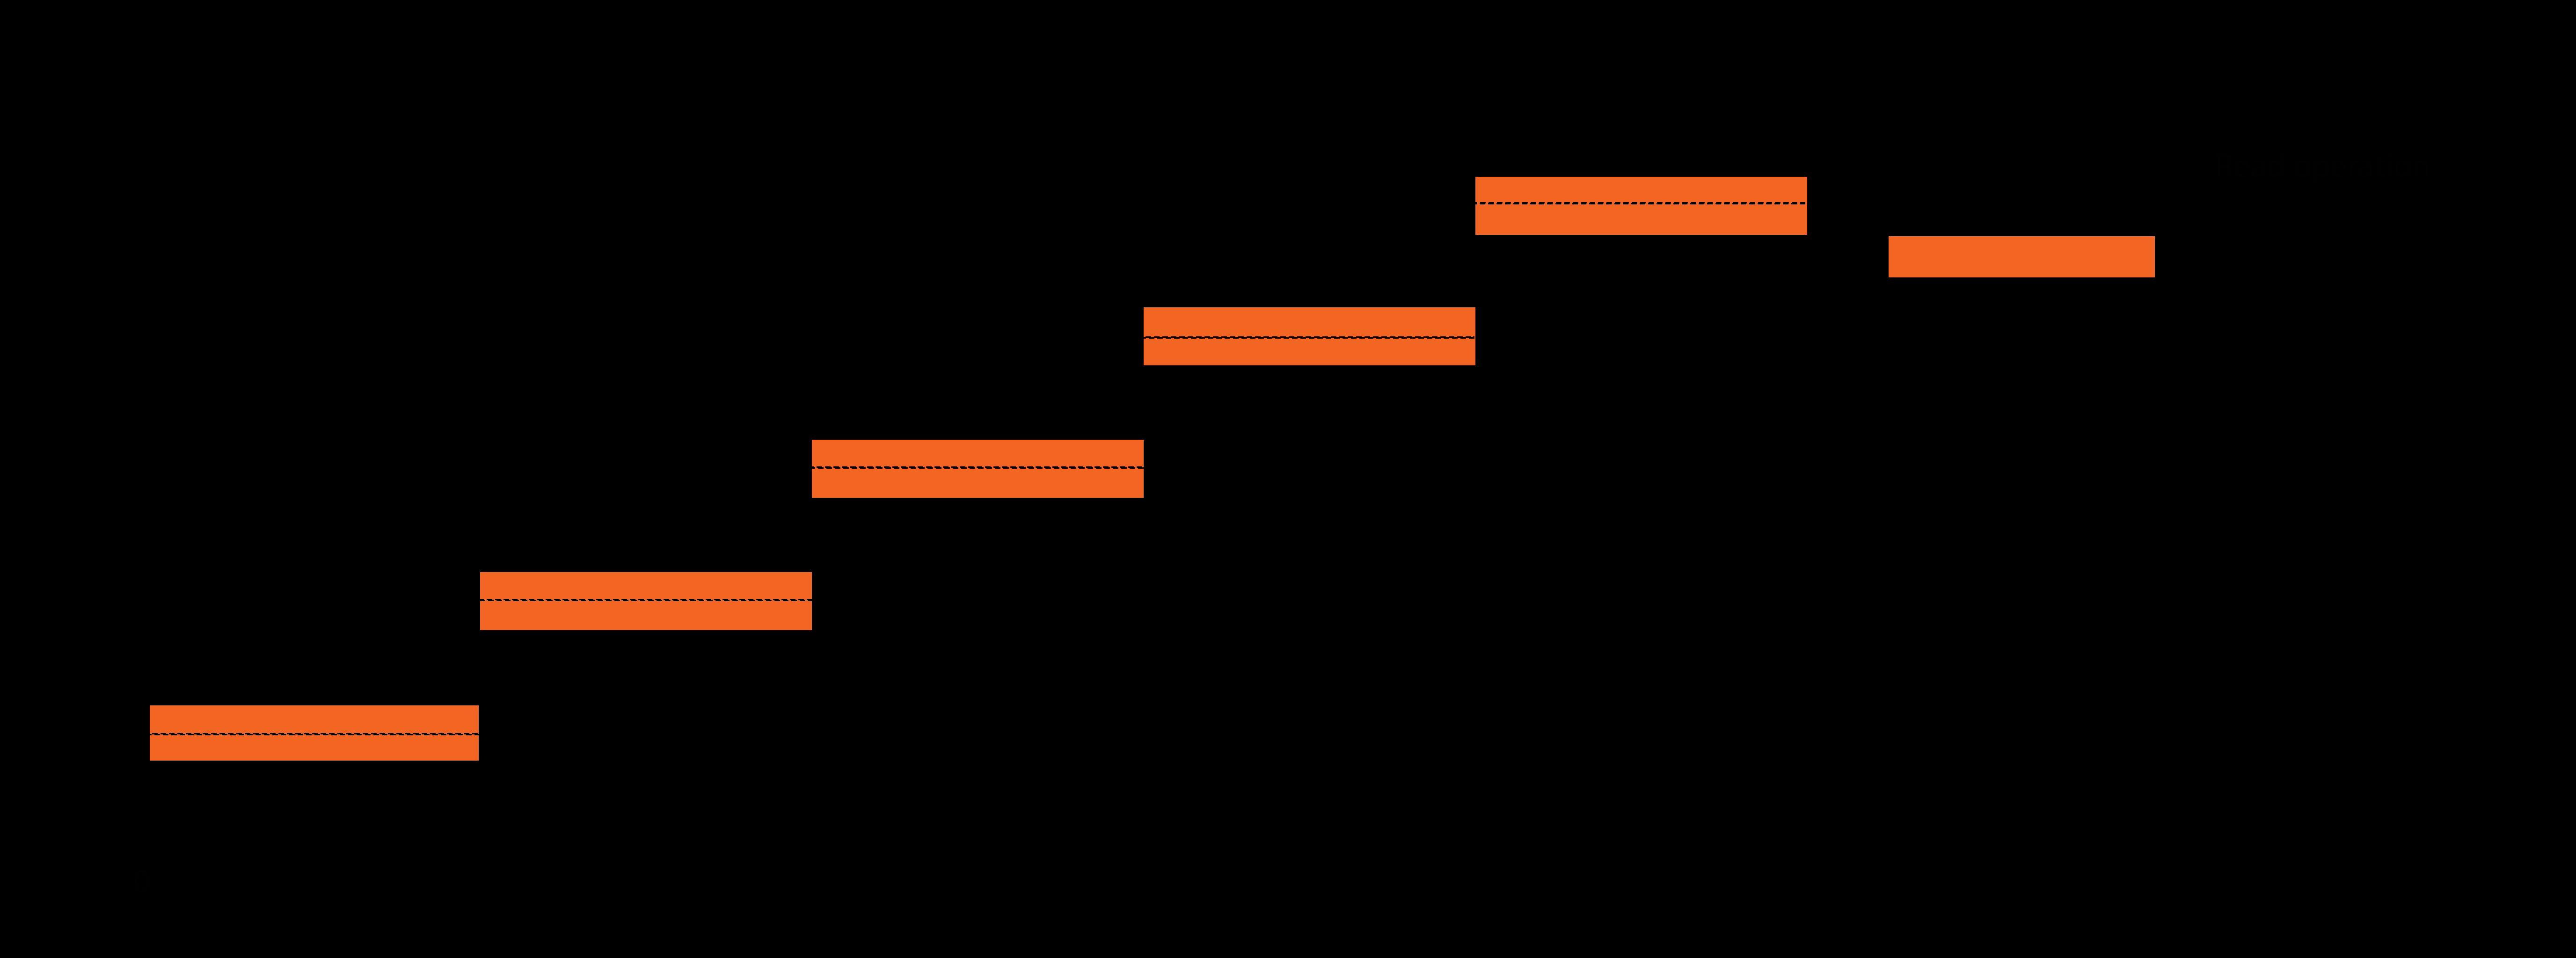 value-based-pagination-offset